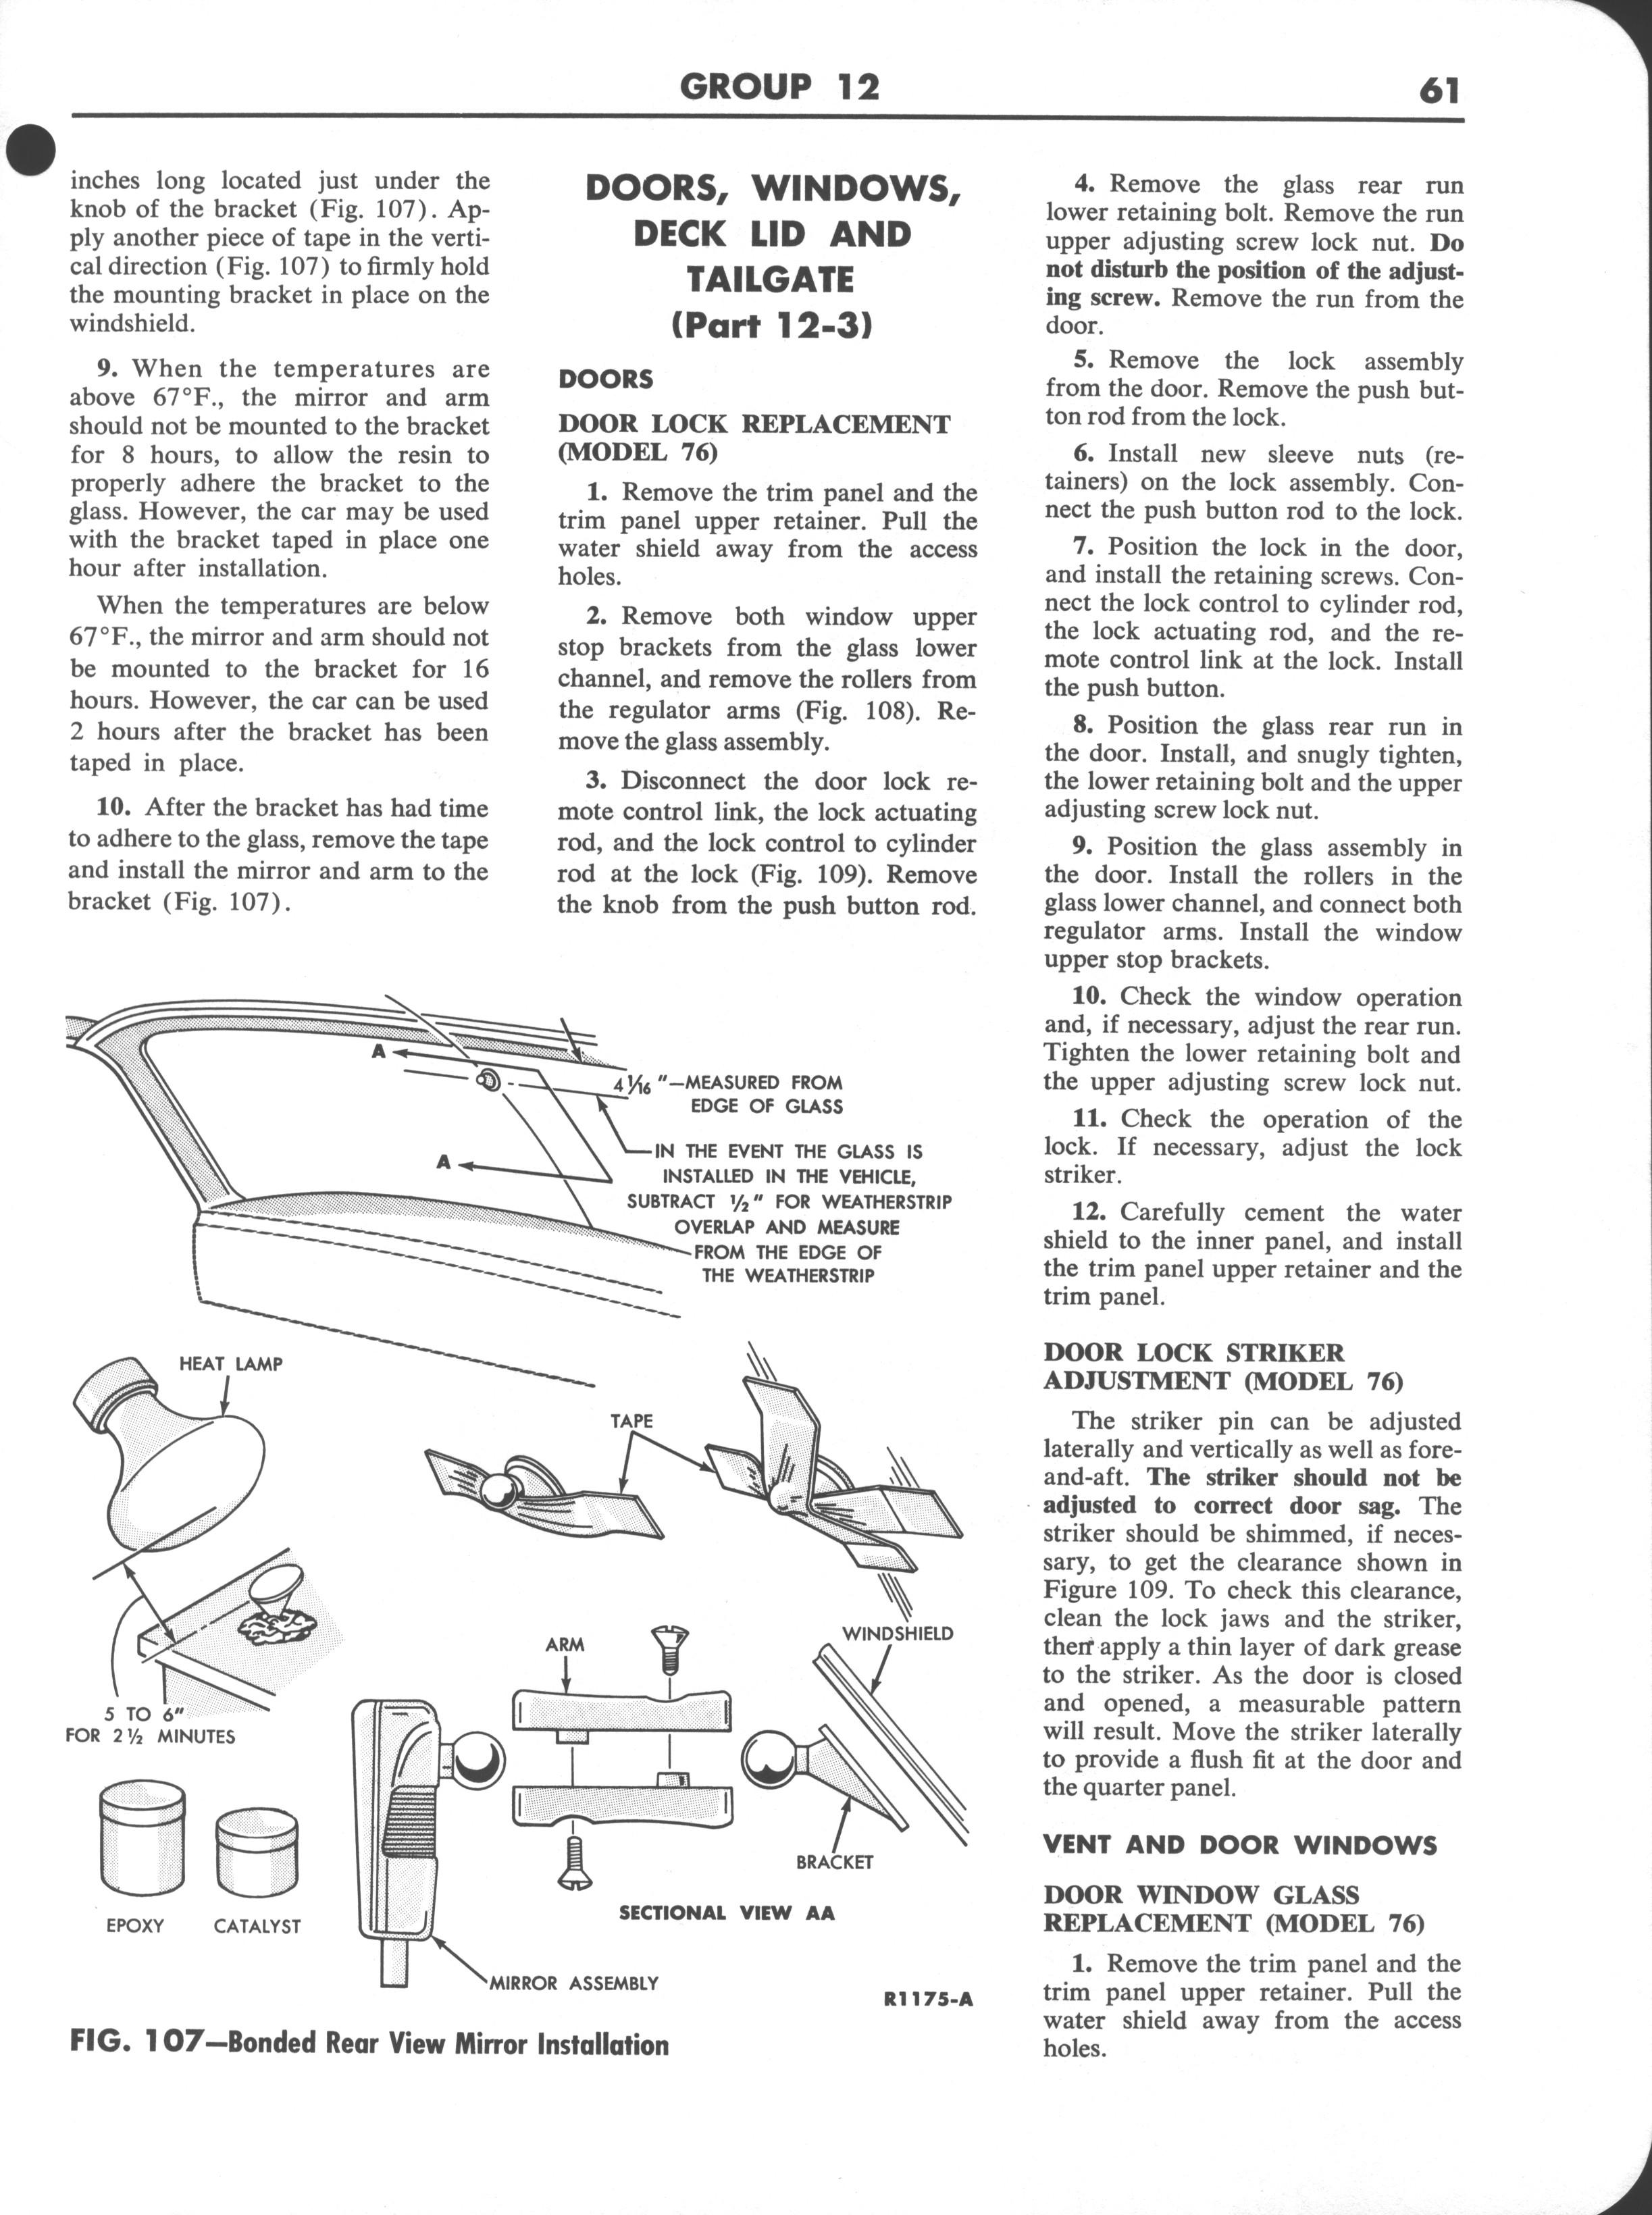 Falcon Shop Manual Supplement, 1963: Page 61